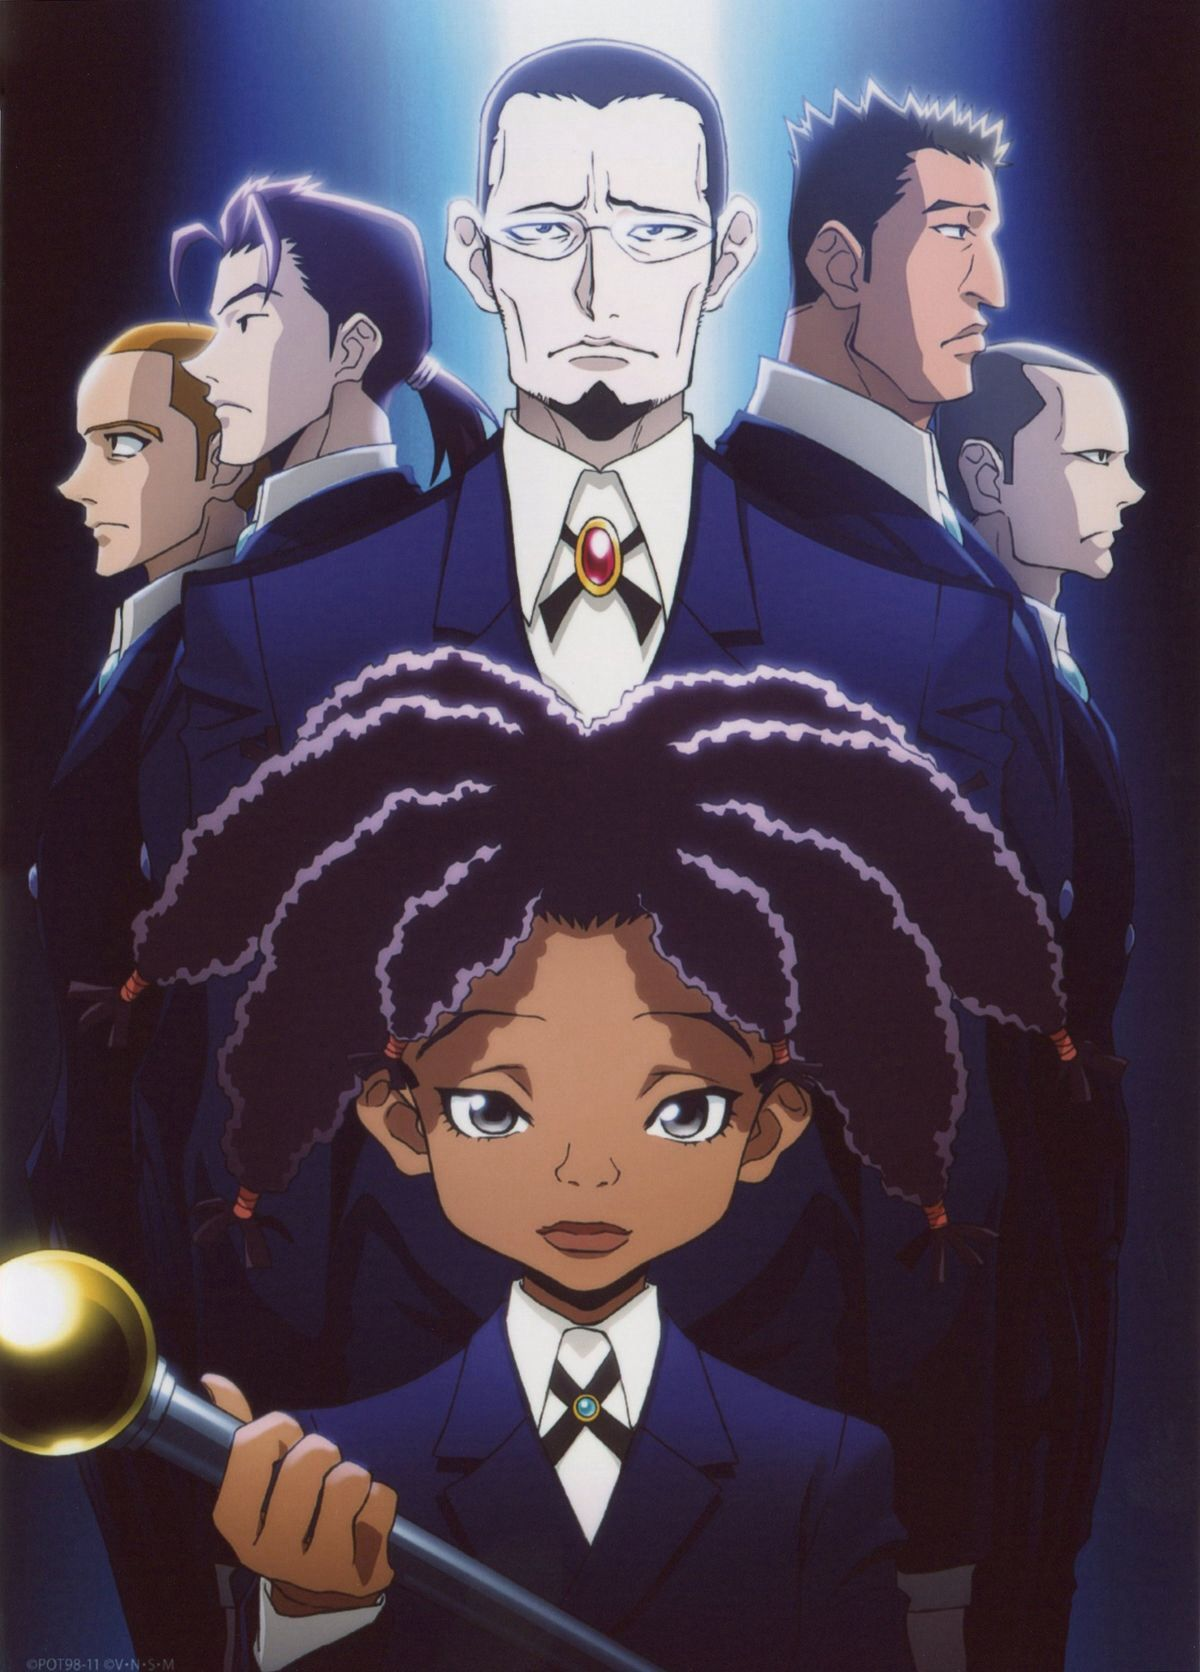 Zoldycks Servants Canary Gotoh Etc Hunter X Hunter Anime Hunter X Hunter Hunter